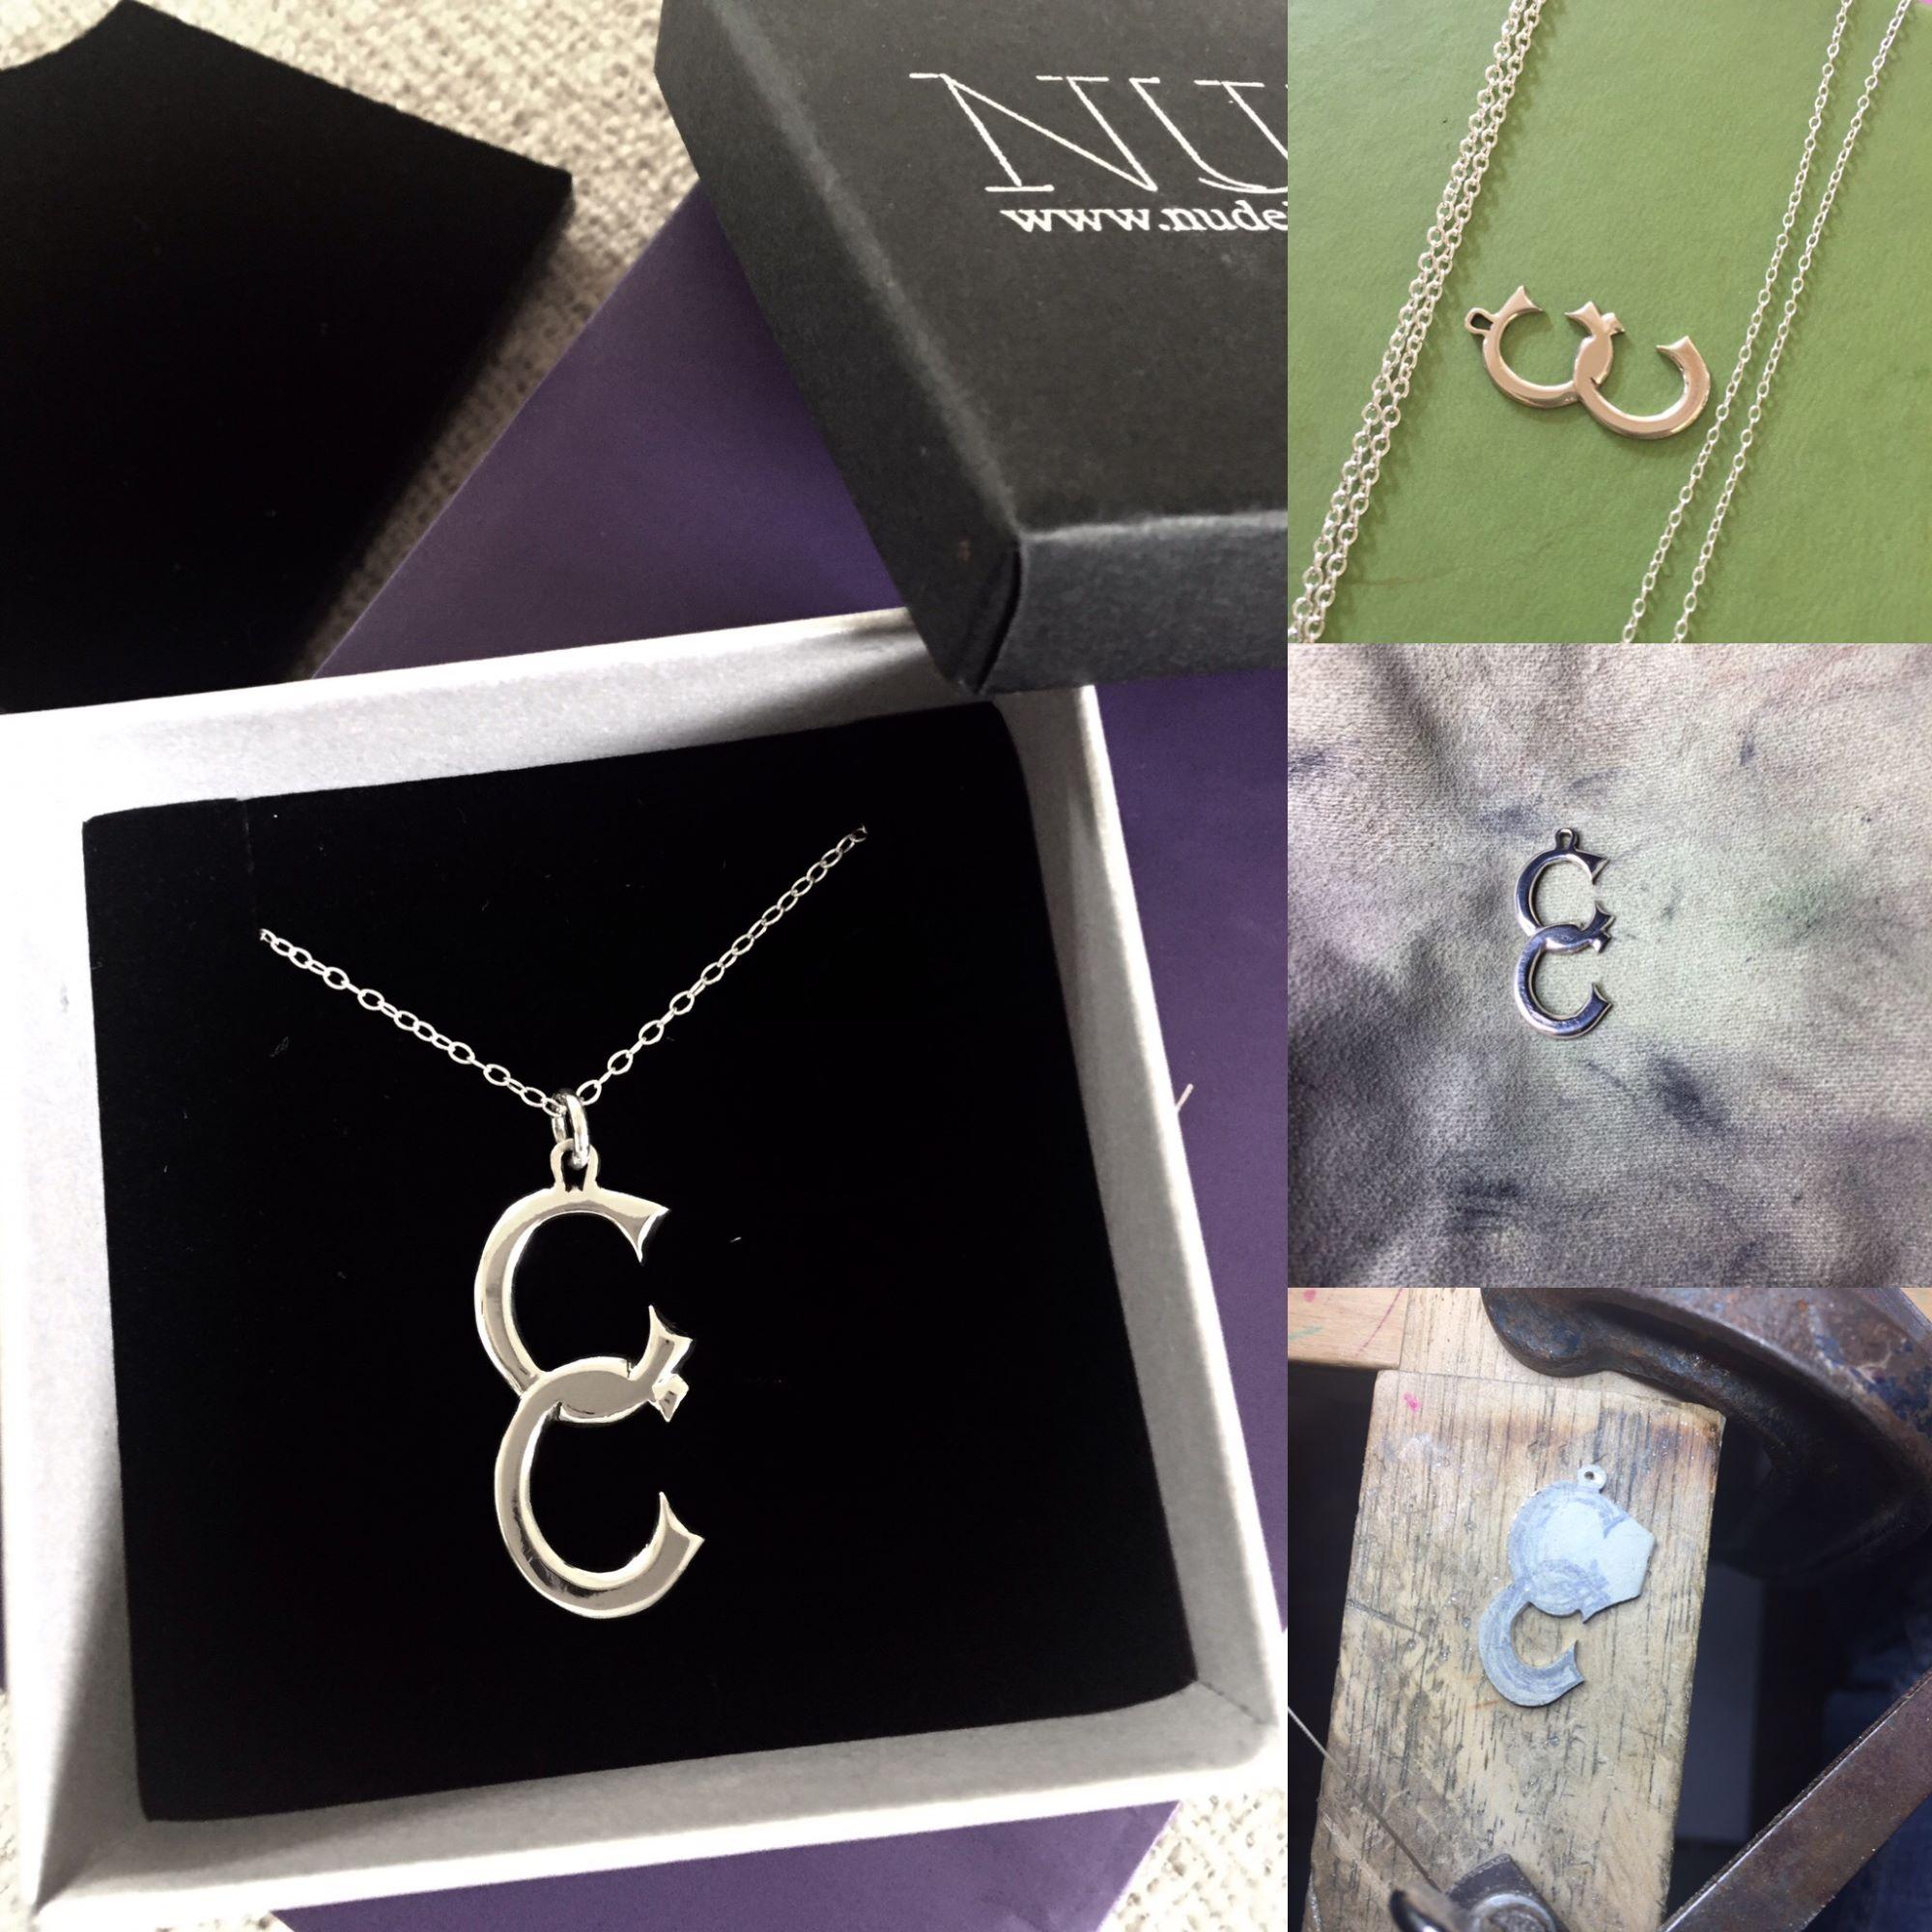 bespoke handmade silver pendant